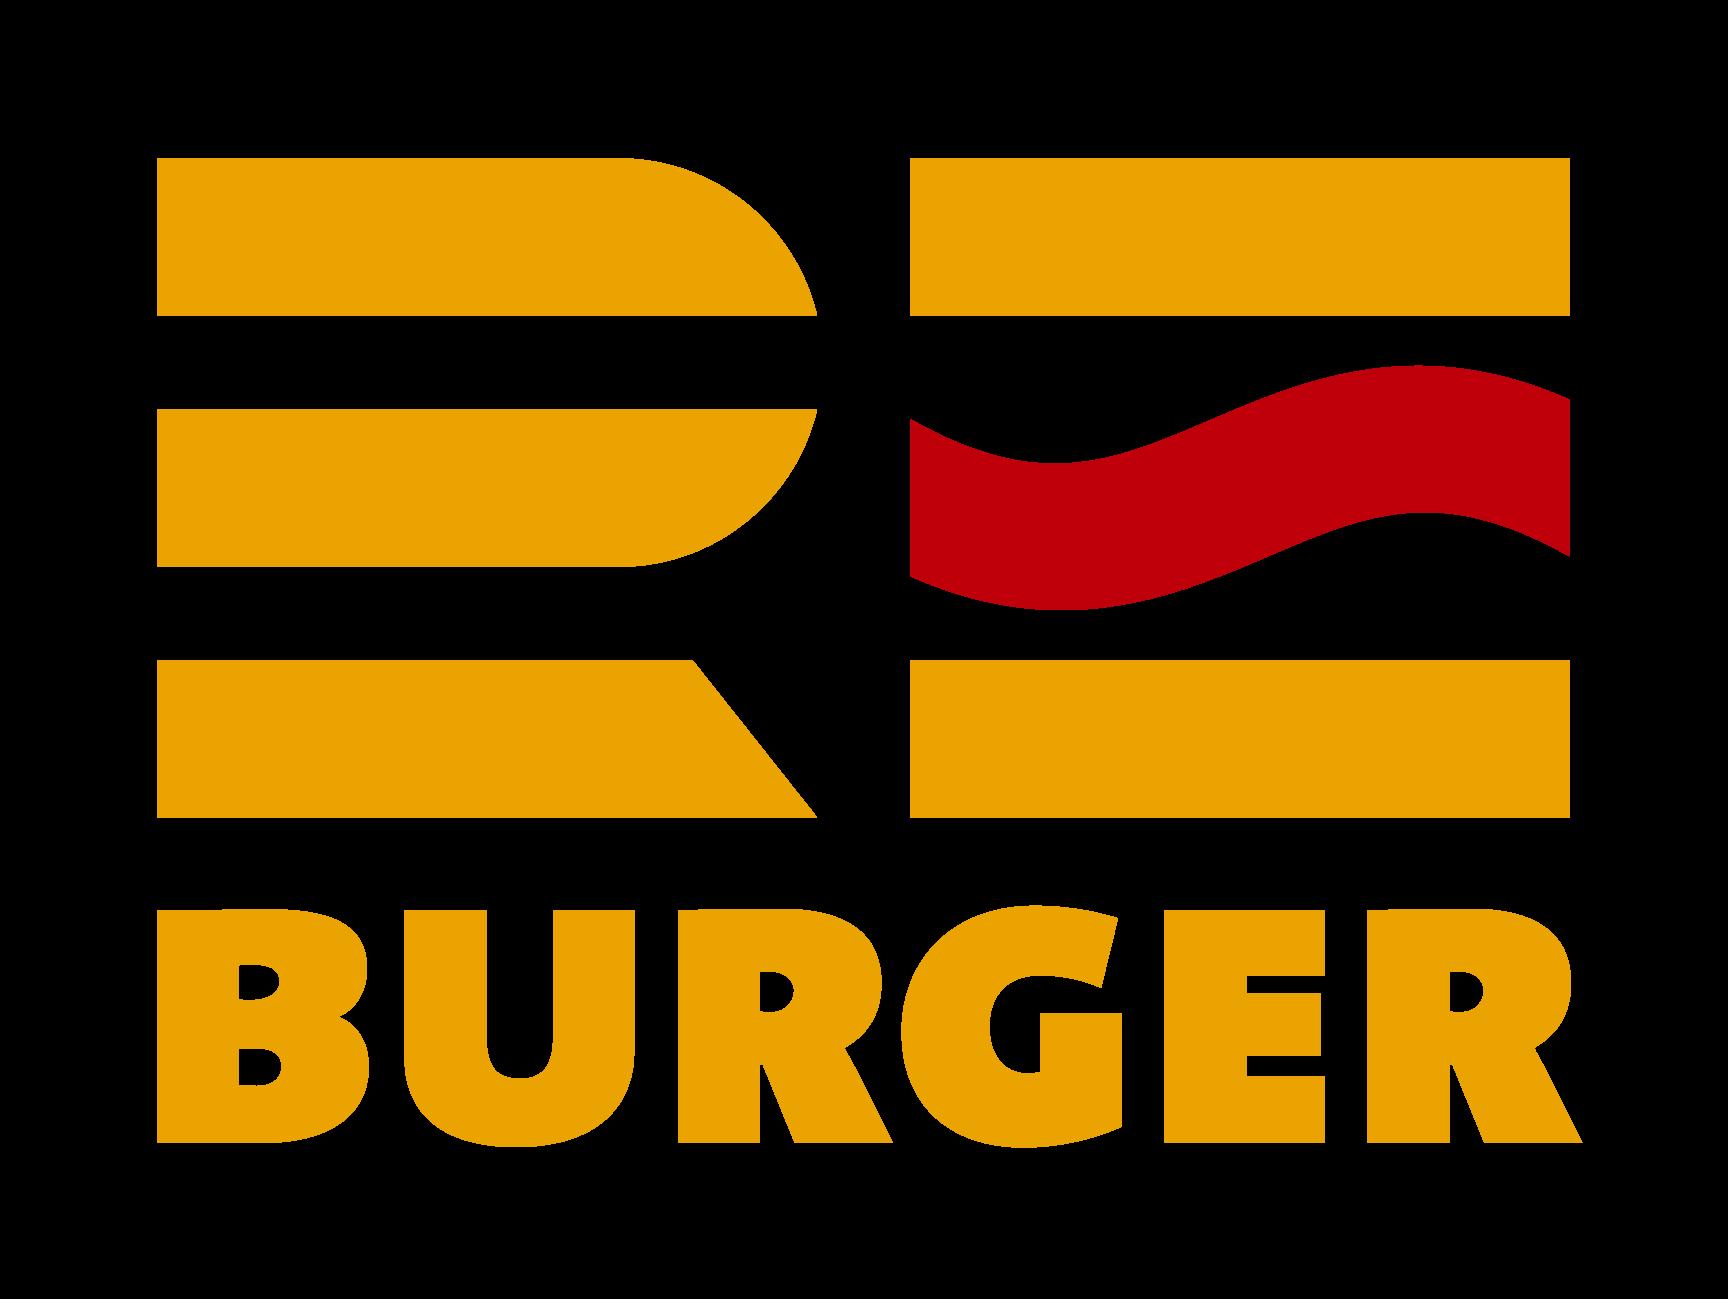 RE:Burger